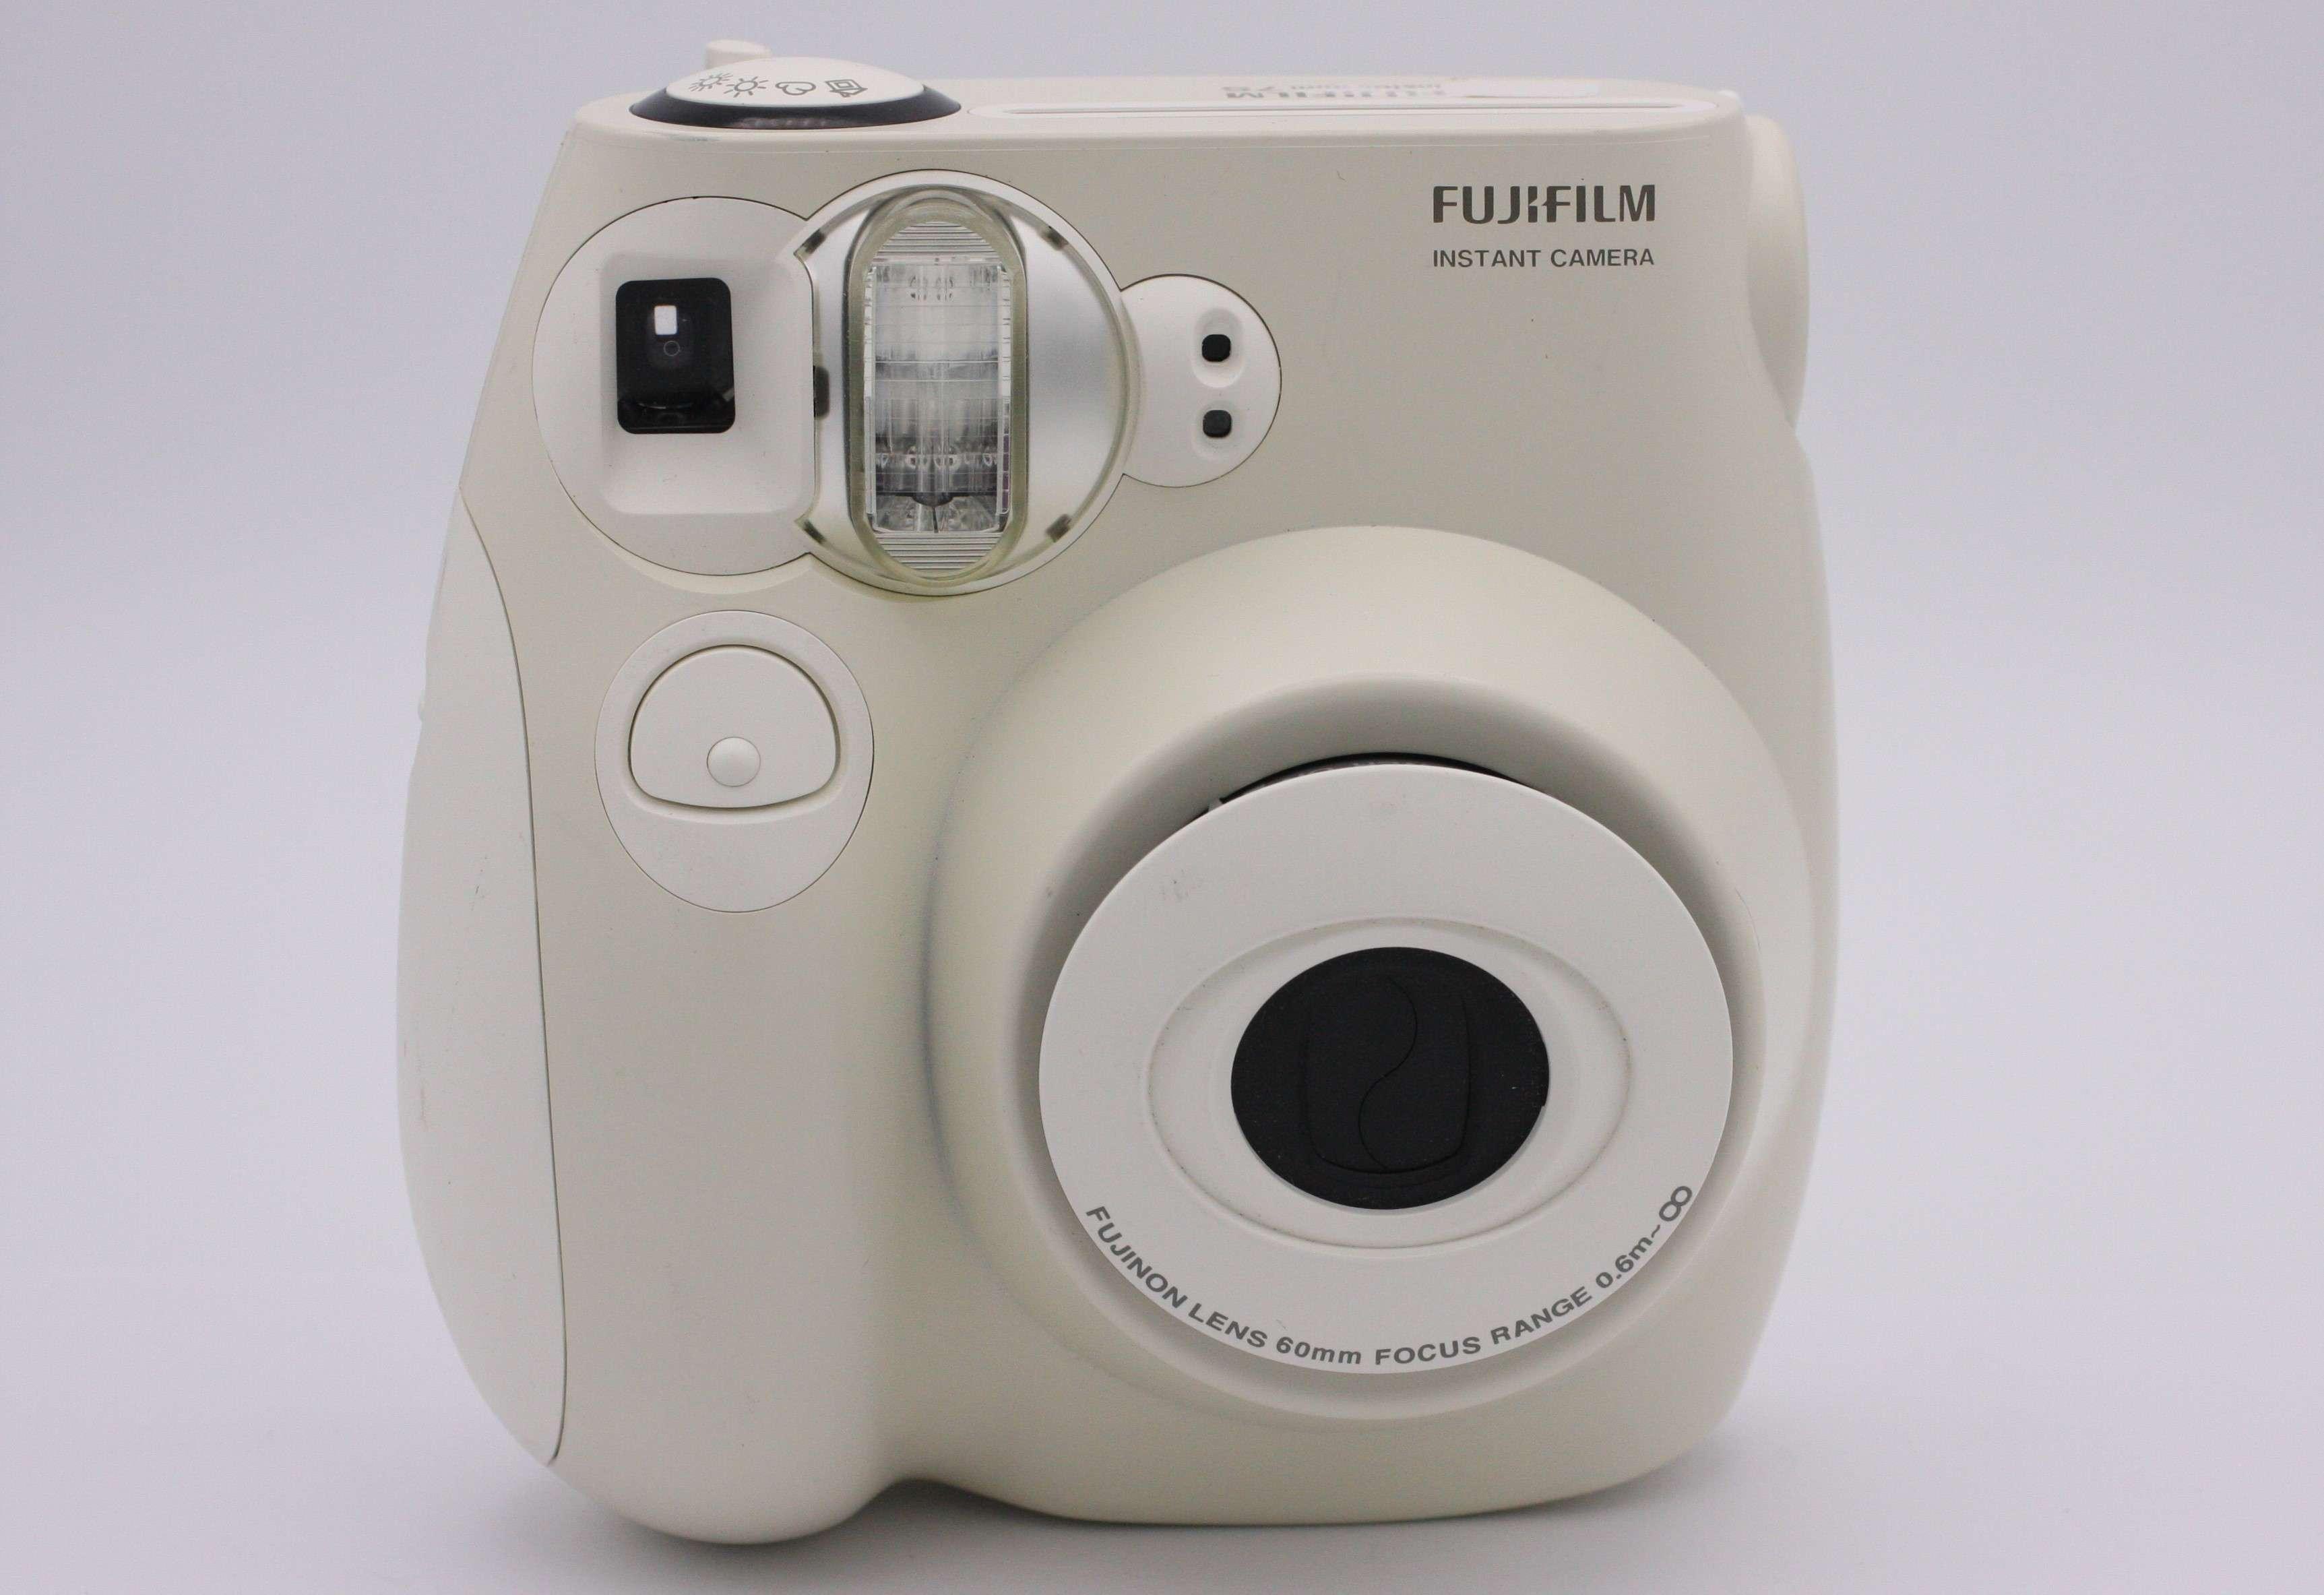 Polaroid Camera Urban Outfitters Uk : Fuji polaroid camera pink urban outfitters best polaroid cameras